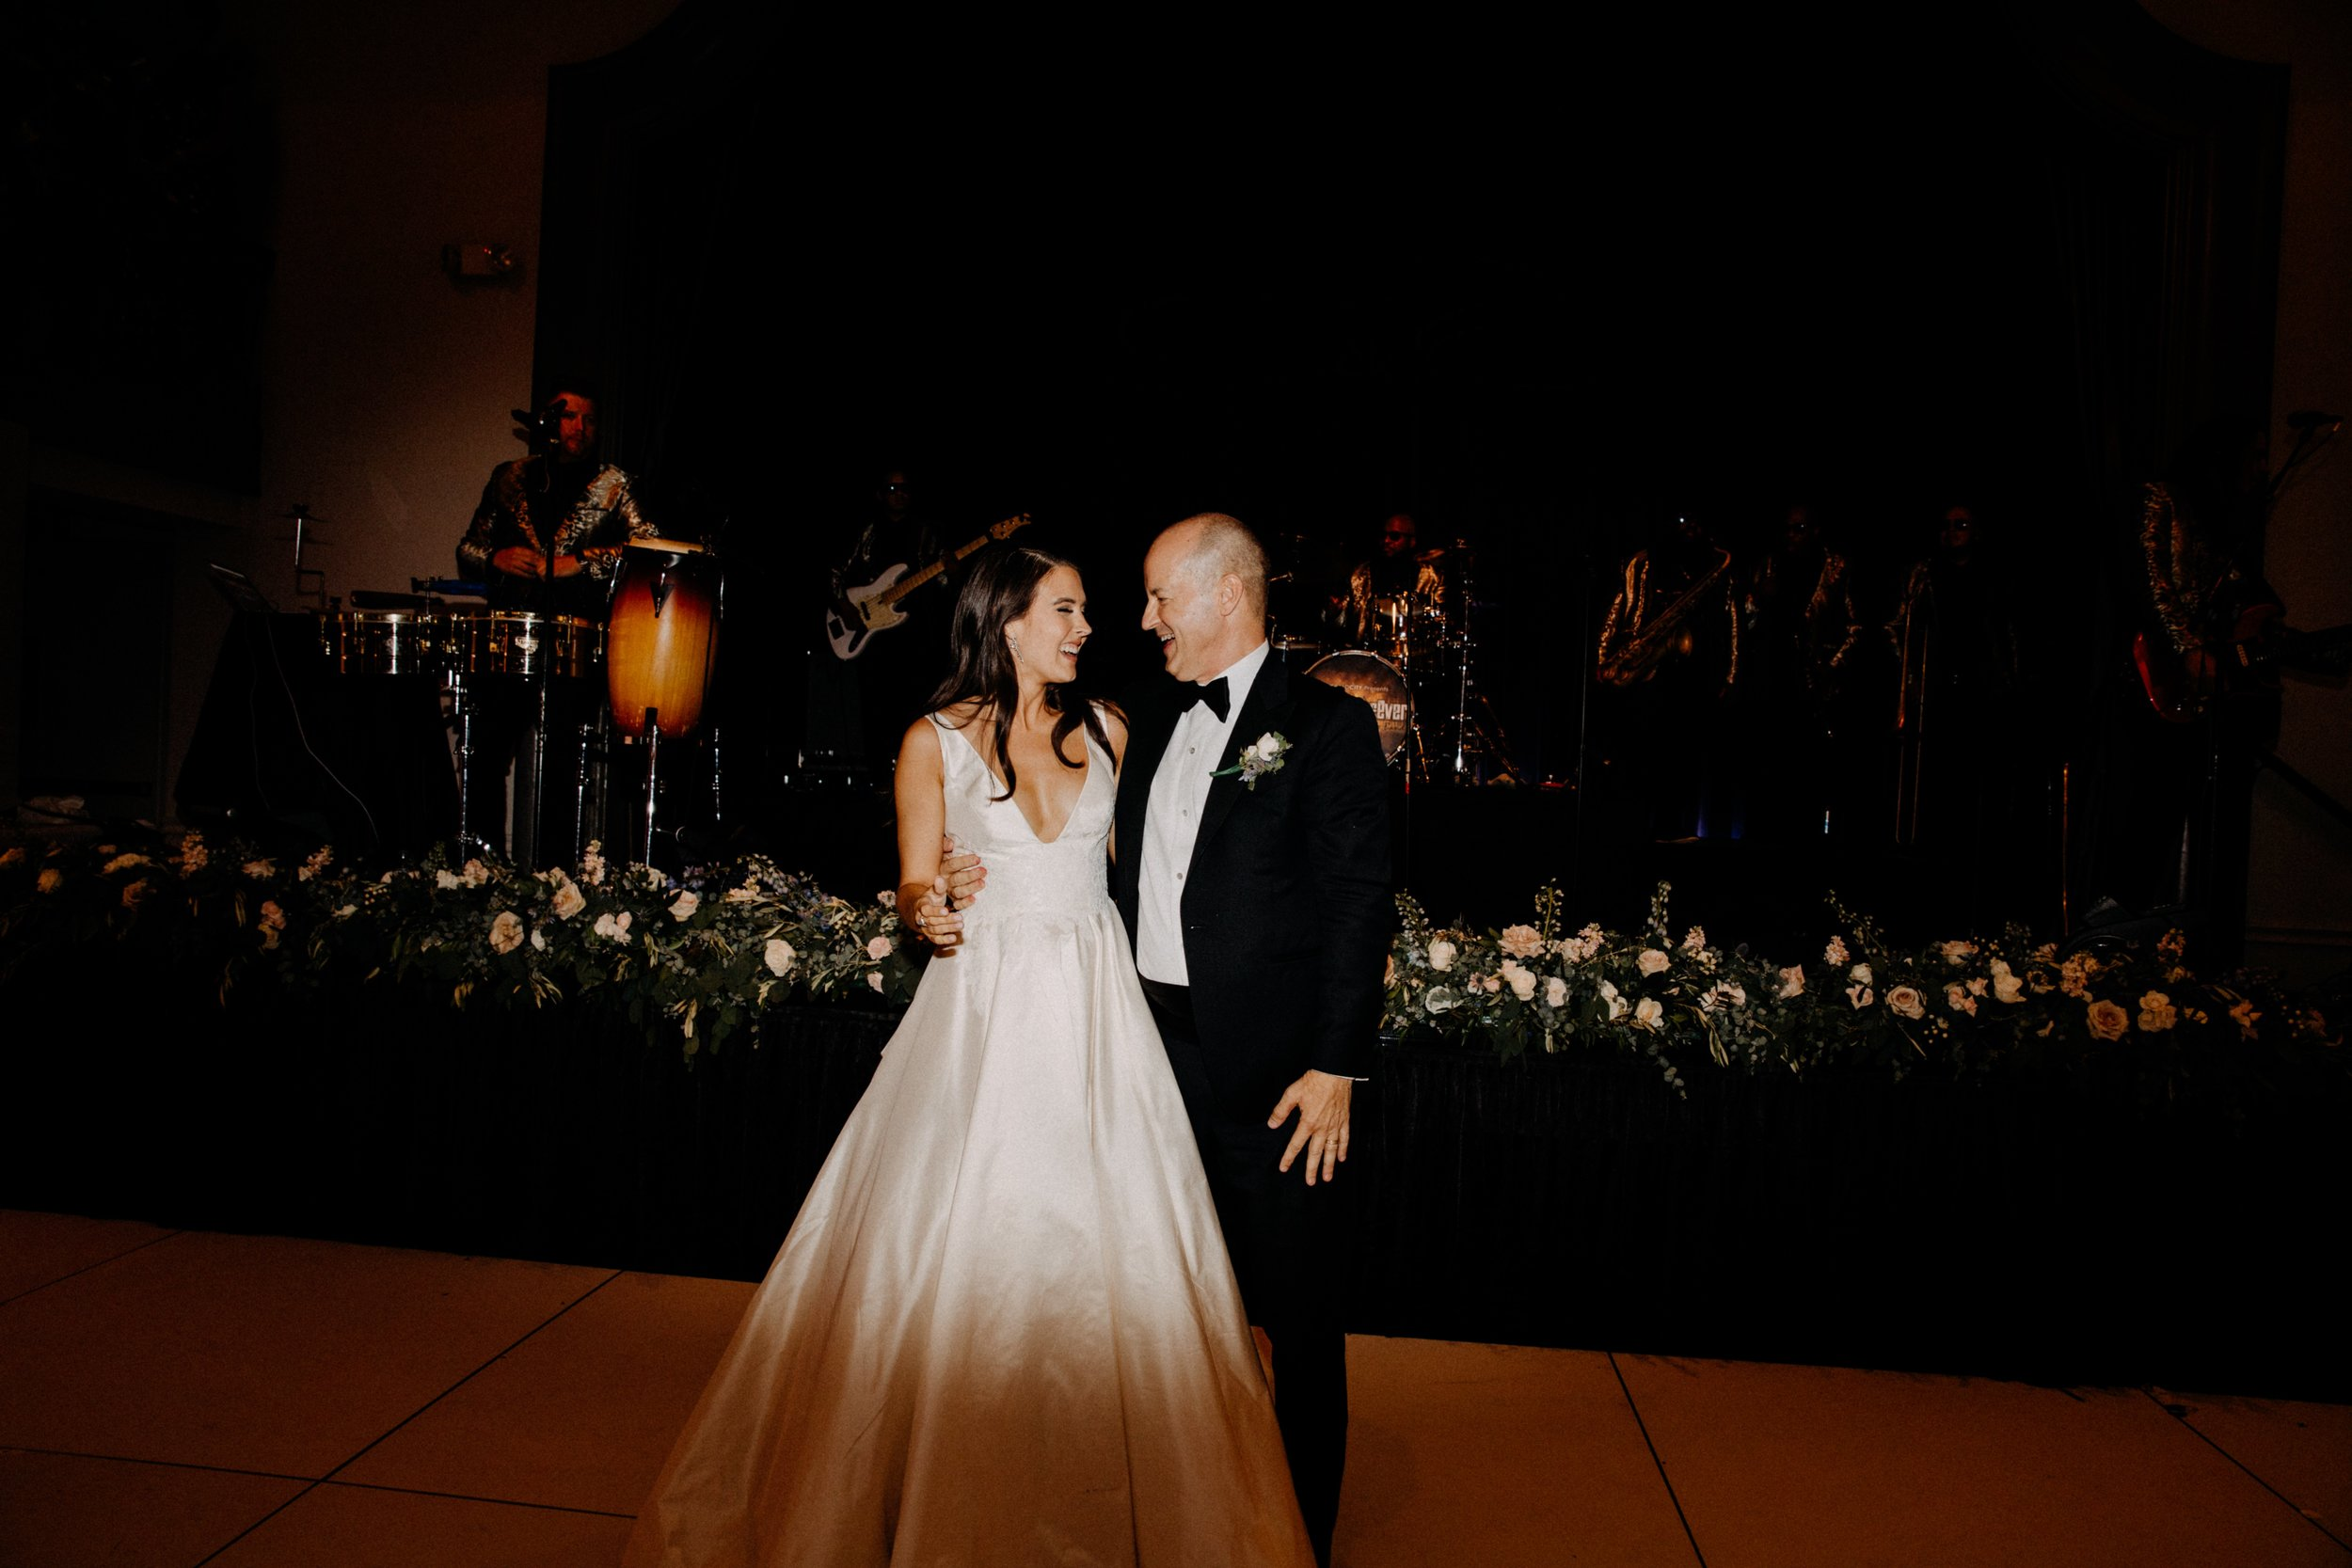 st-anthony-hotel-wedding-photography-10159san-antonio.JPG